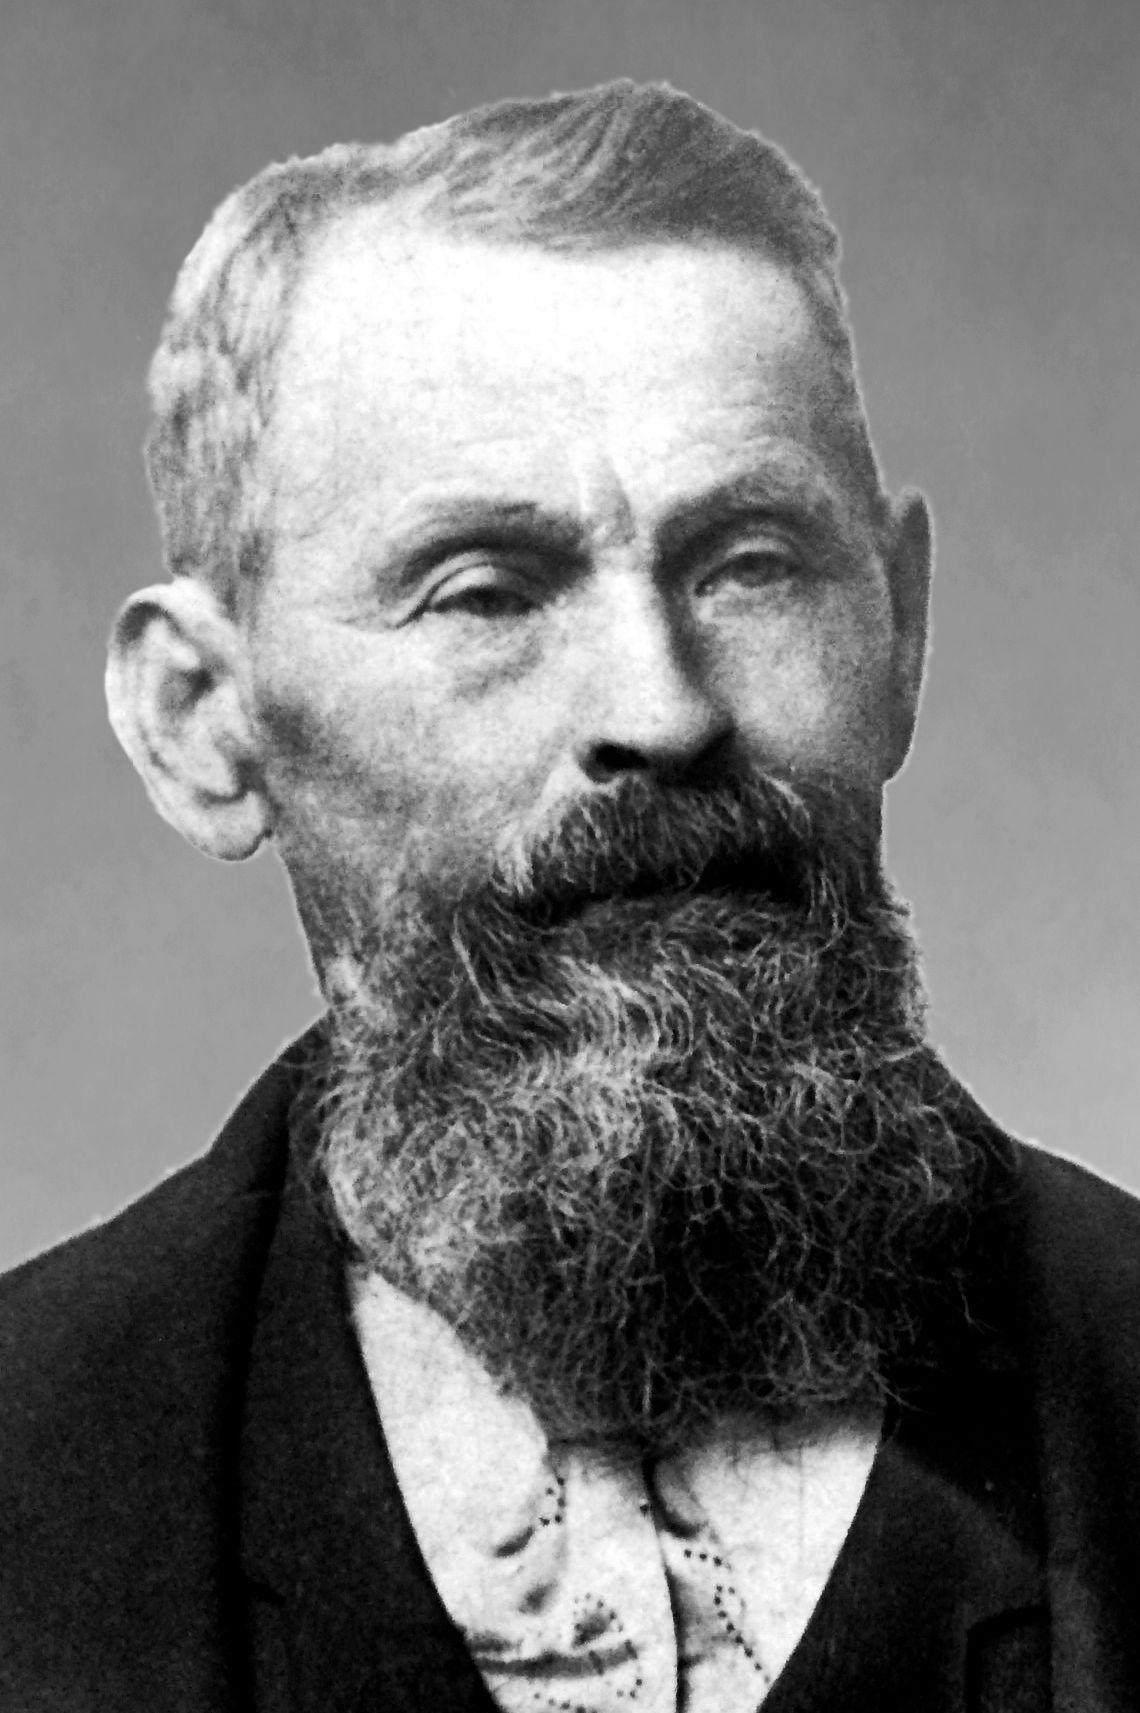 McClellan, William Carroll